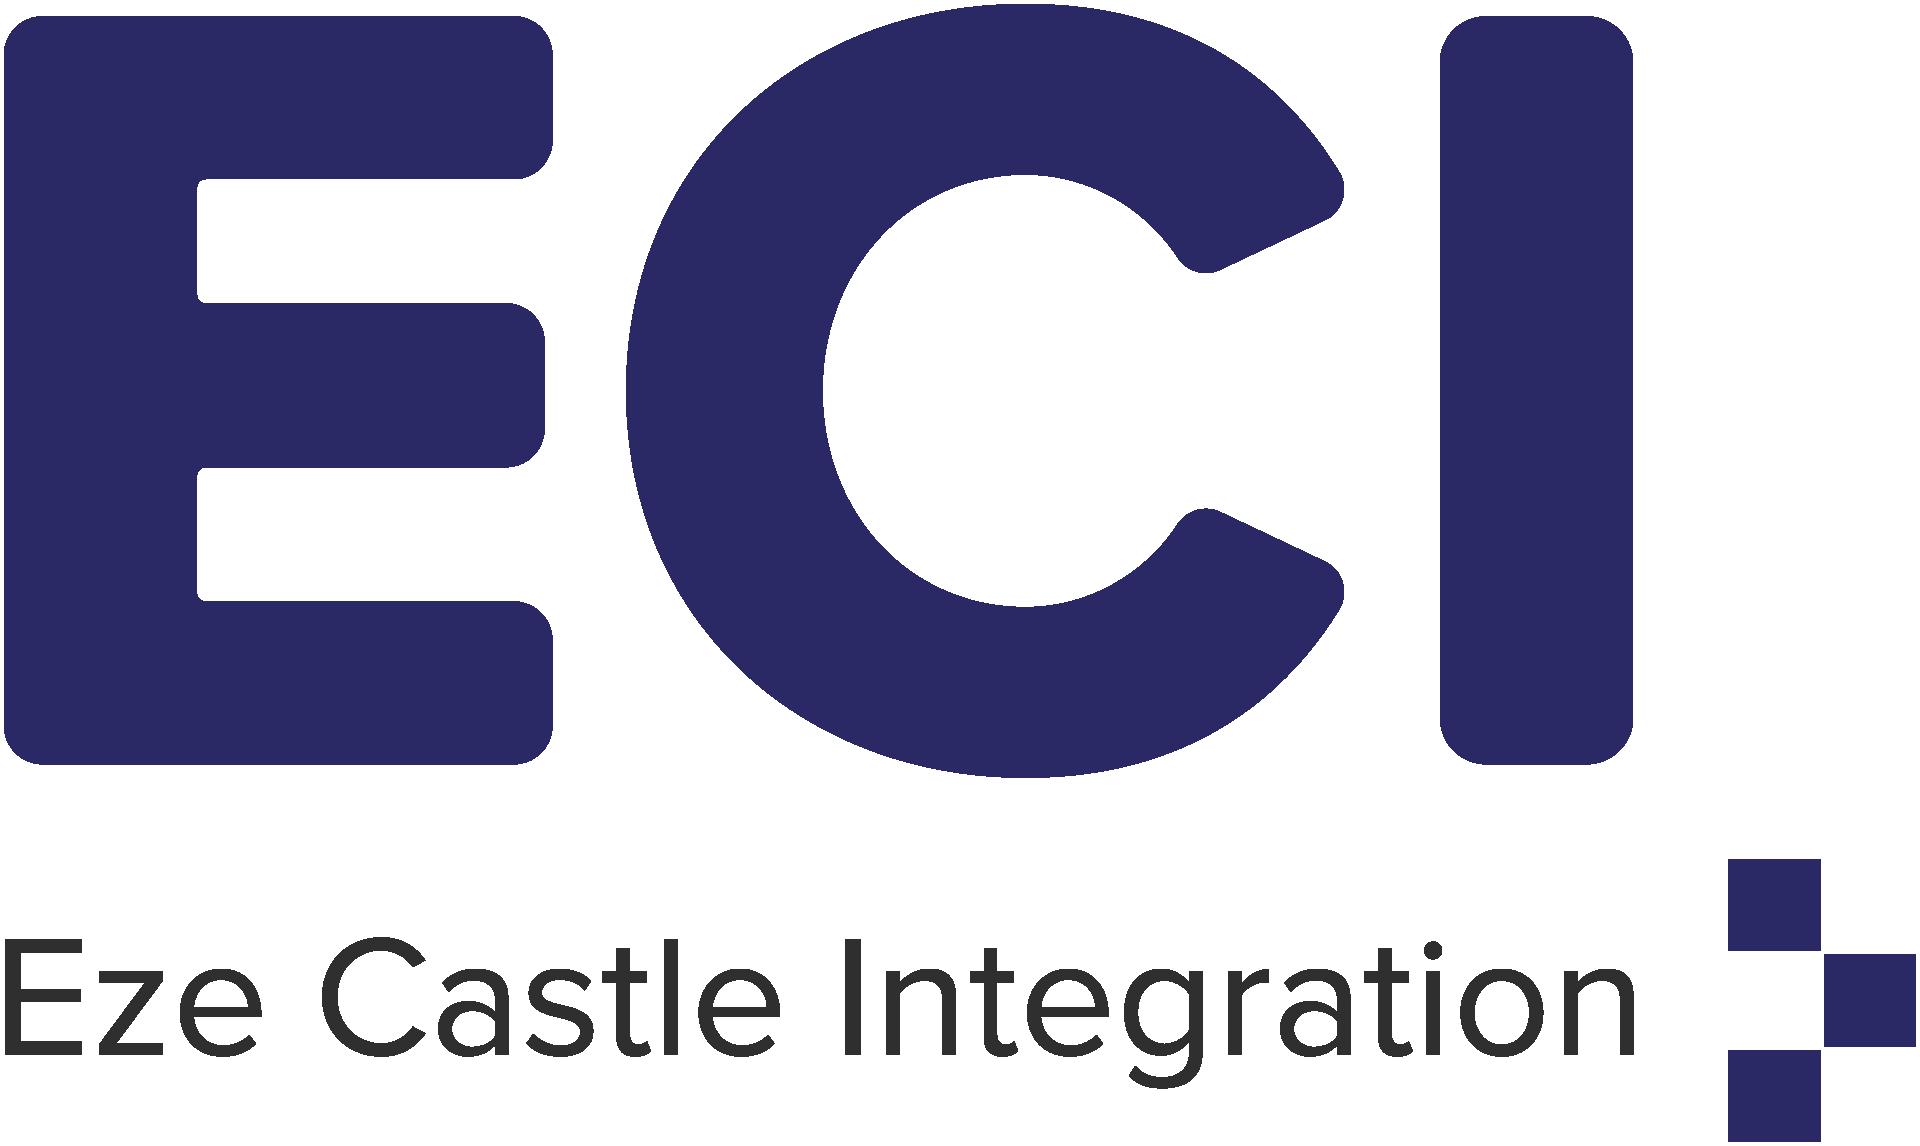 Eze Castle Integration (ECI)